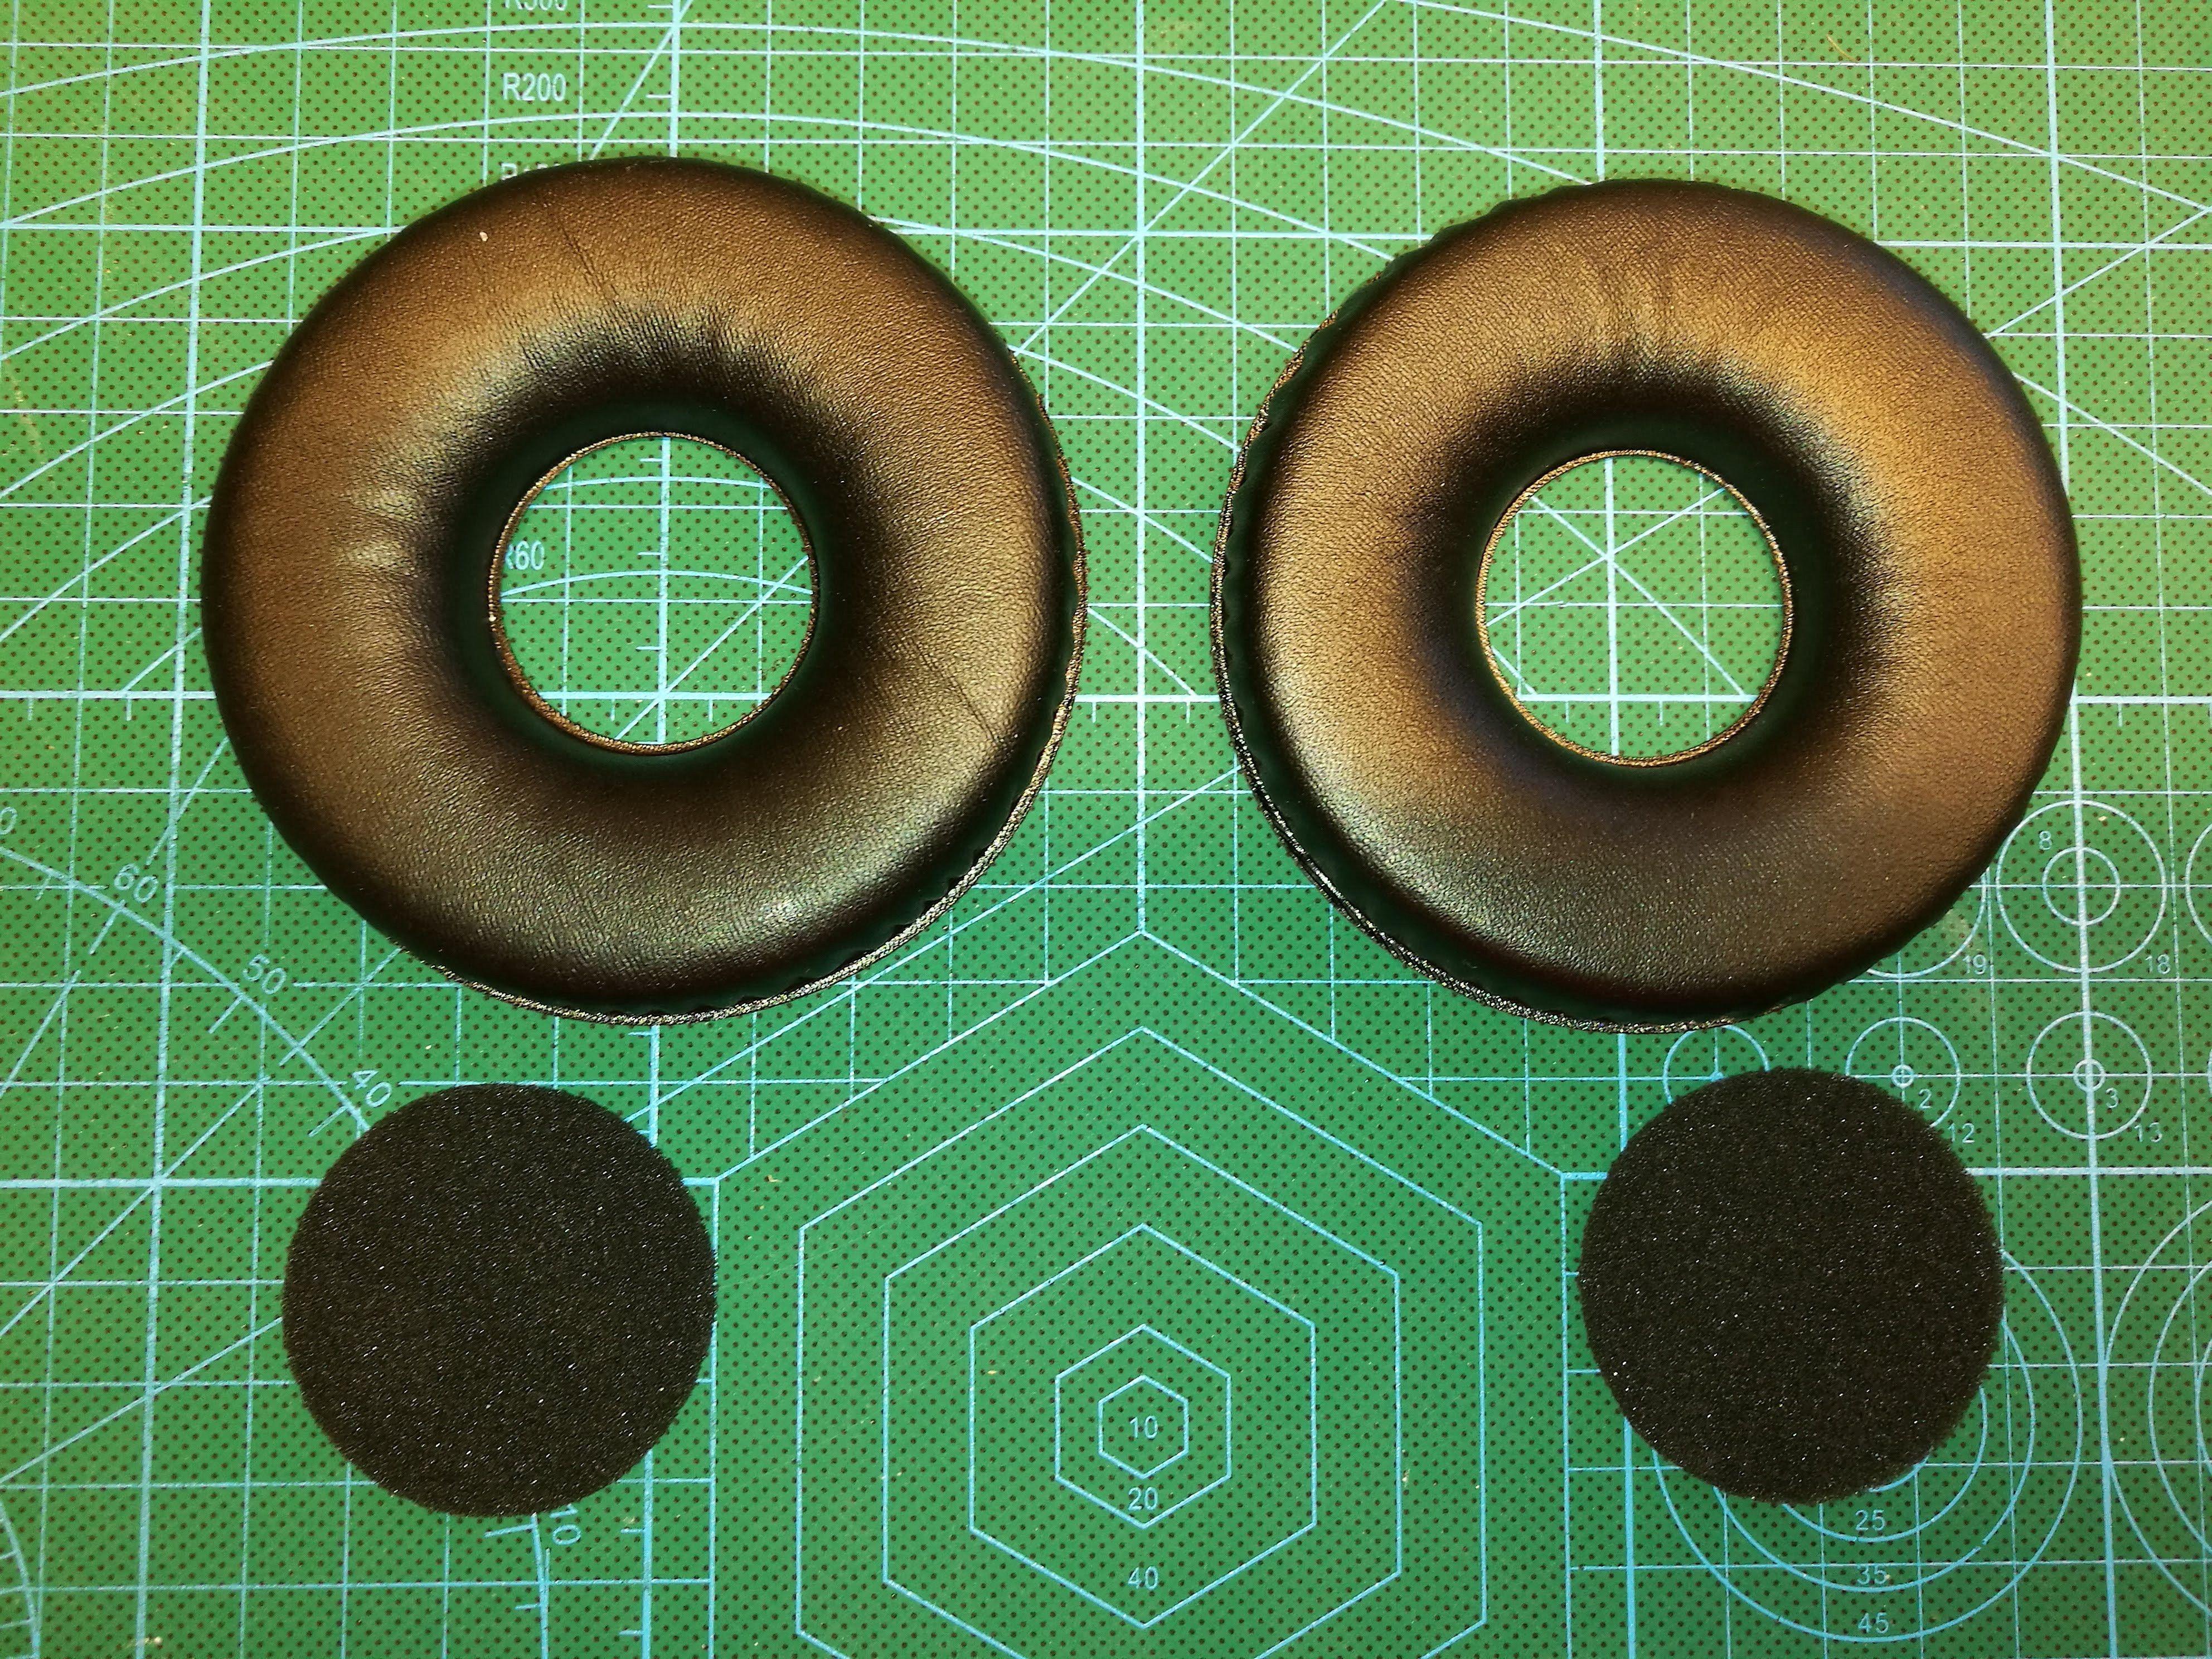 2 stk puter og 2 stk filter (skumgummi)